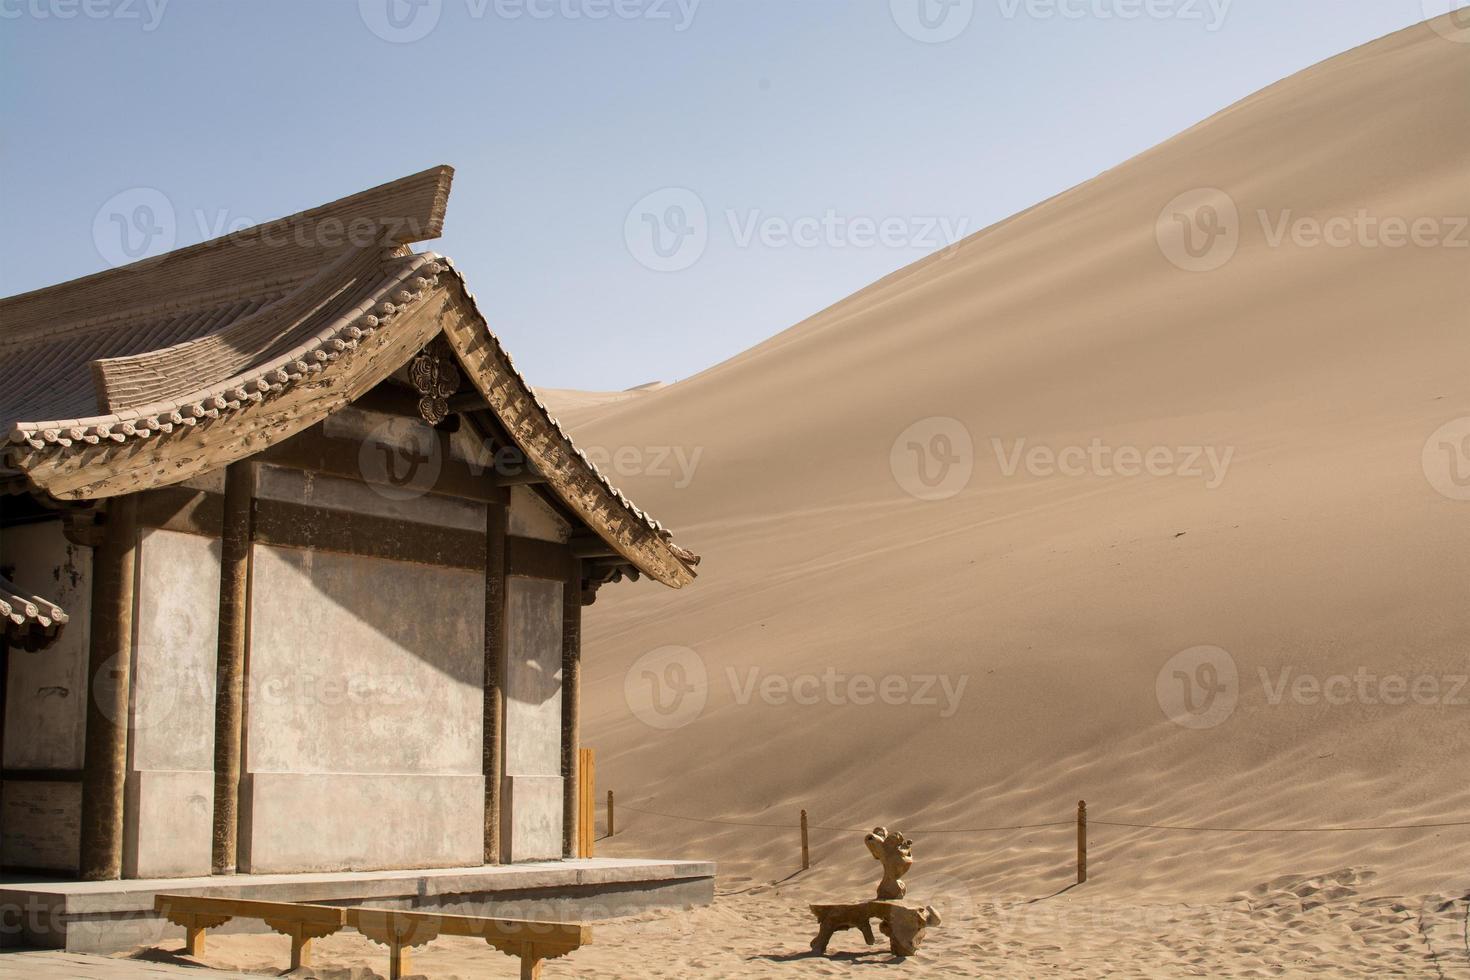 chinesischer Pavillon nahe Sanddünen in der Wüste, Dunhuang, China foto